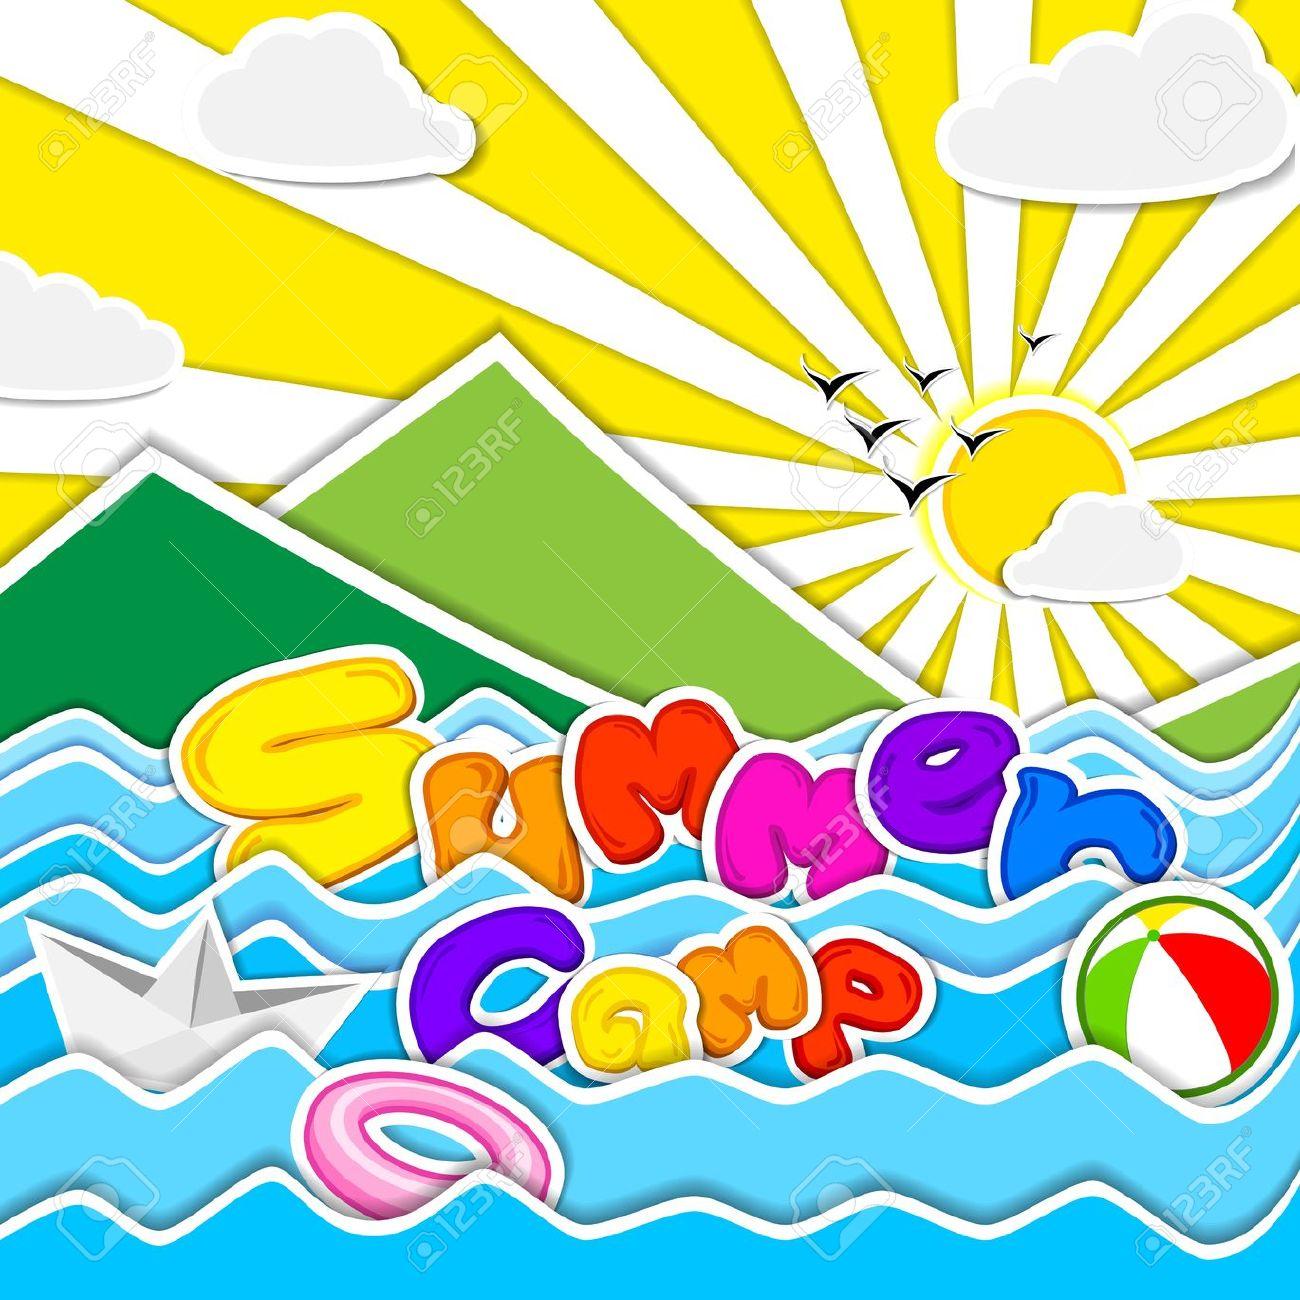 Summer camp clipart 0 5